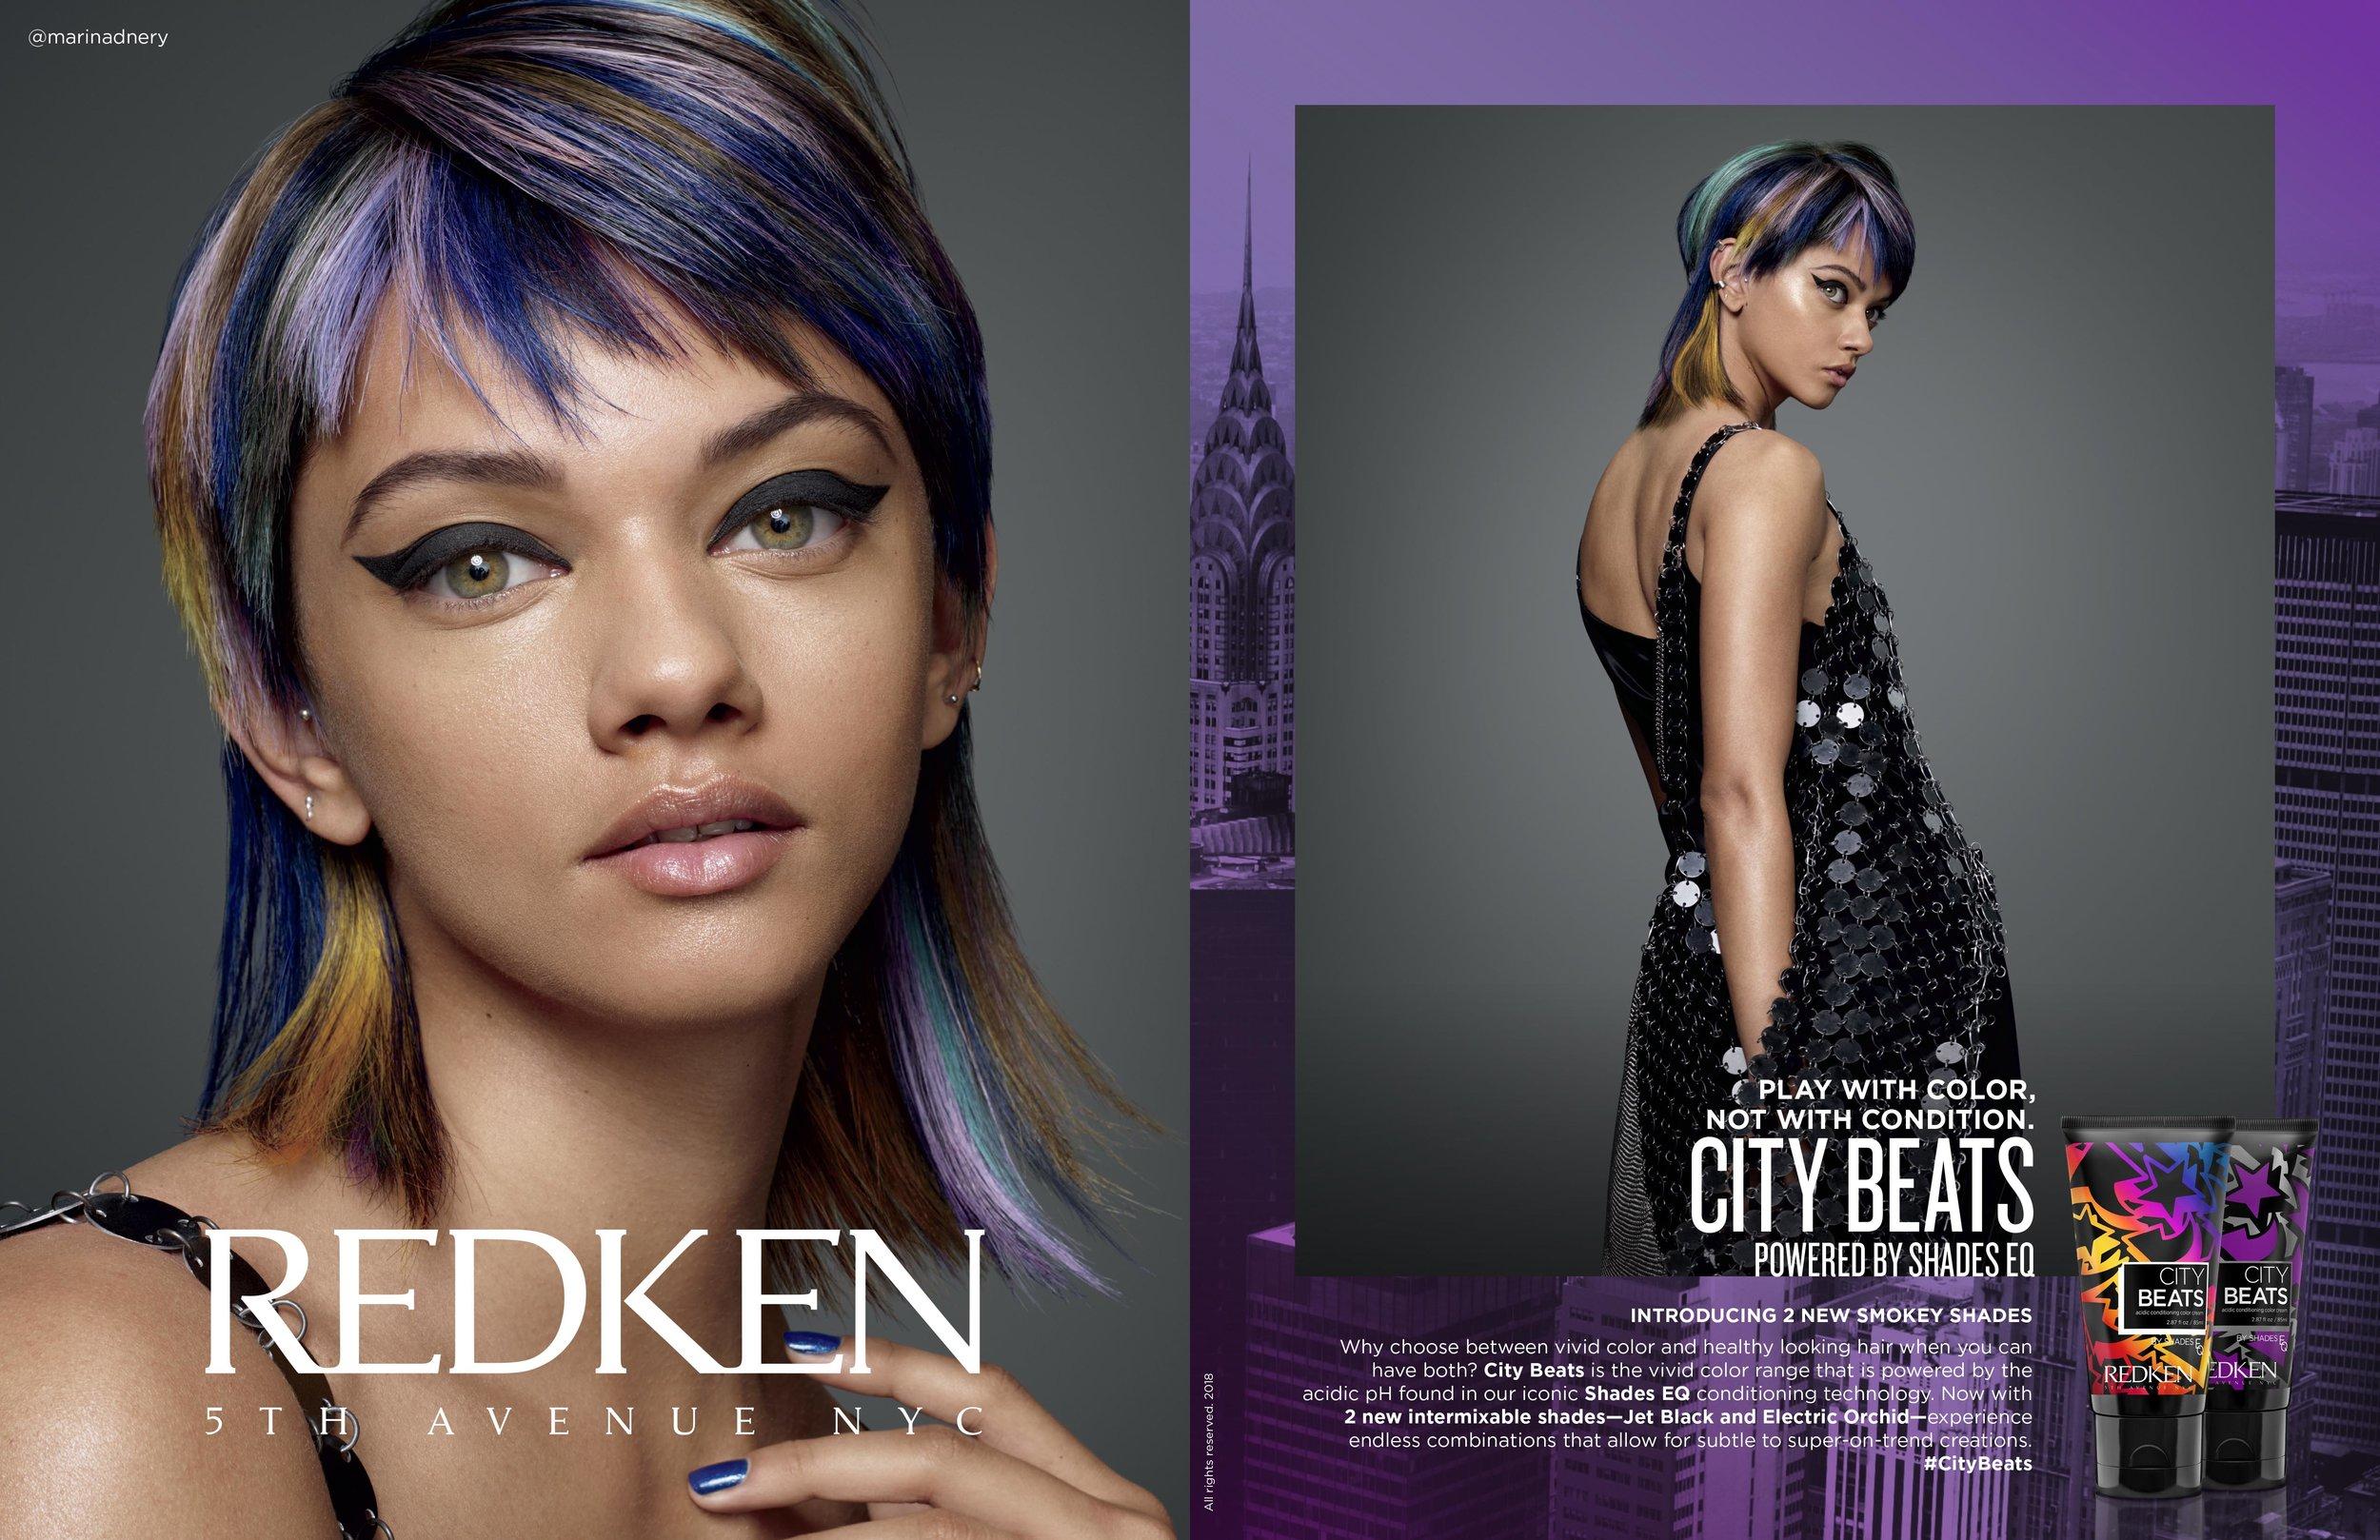 Redken-GL-2018-Electric-Orchid-Jet-Black-Trade-Ad.jpg